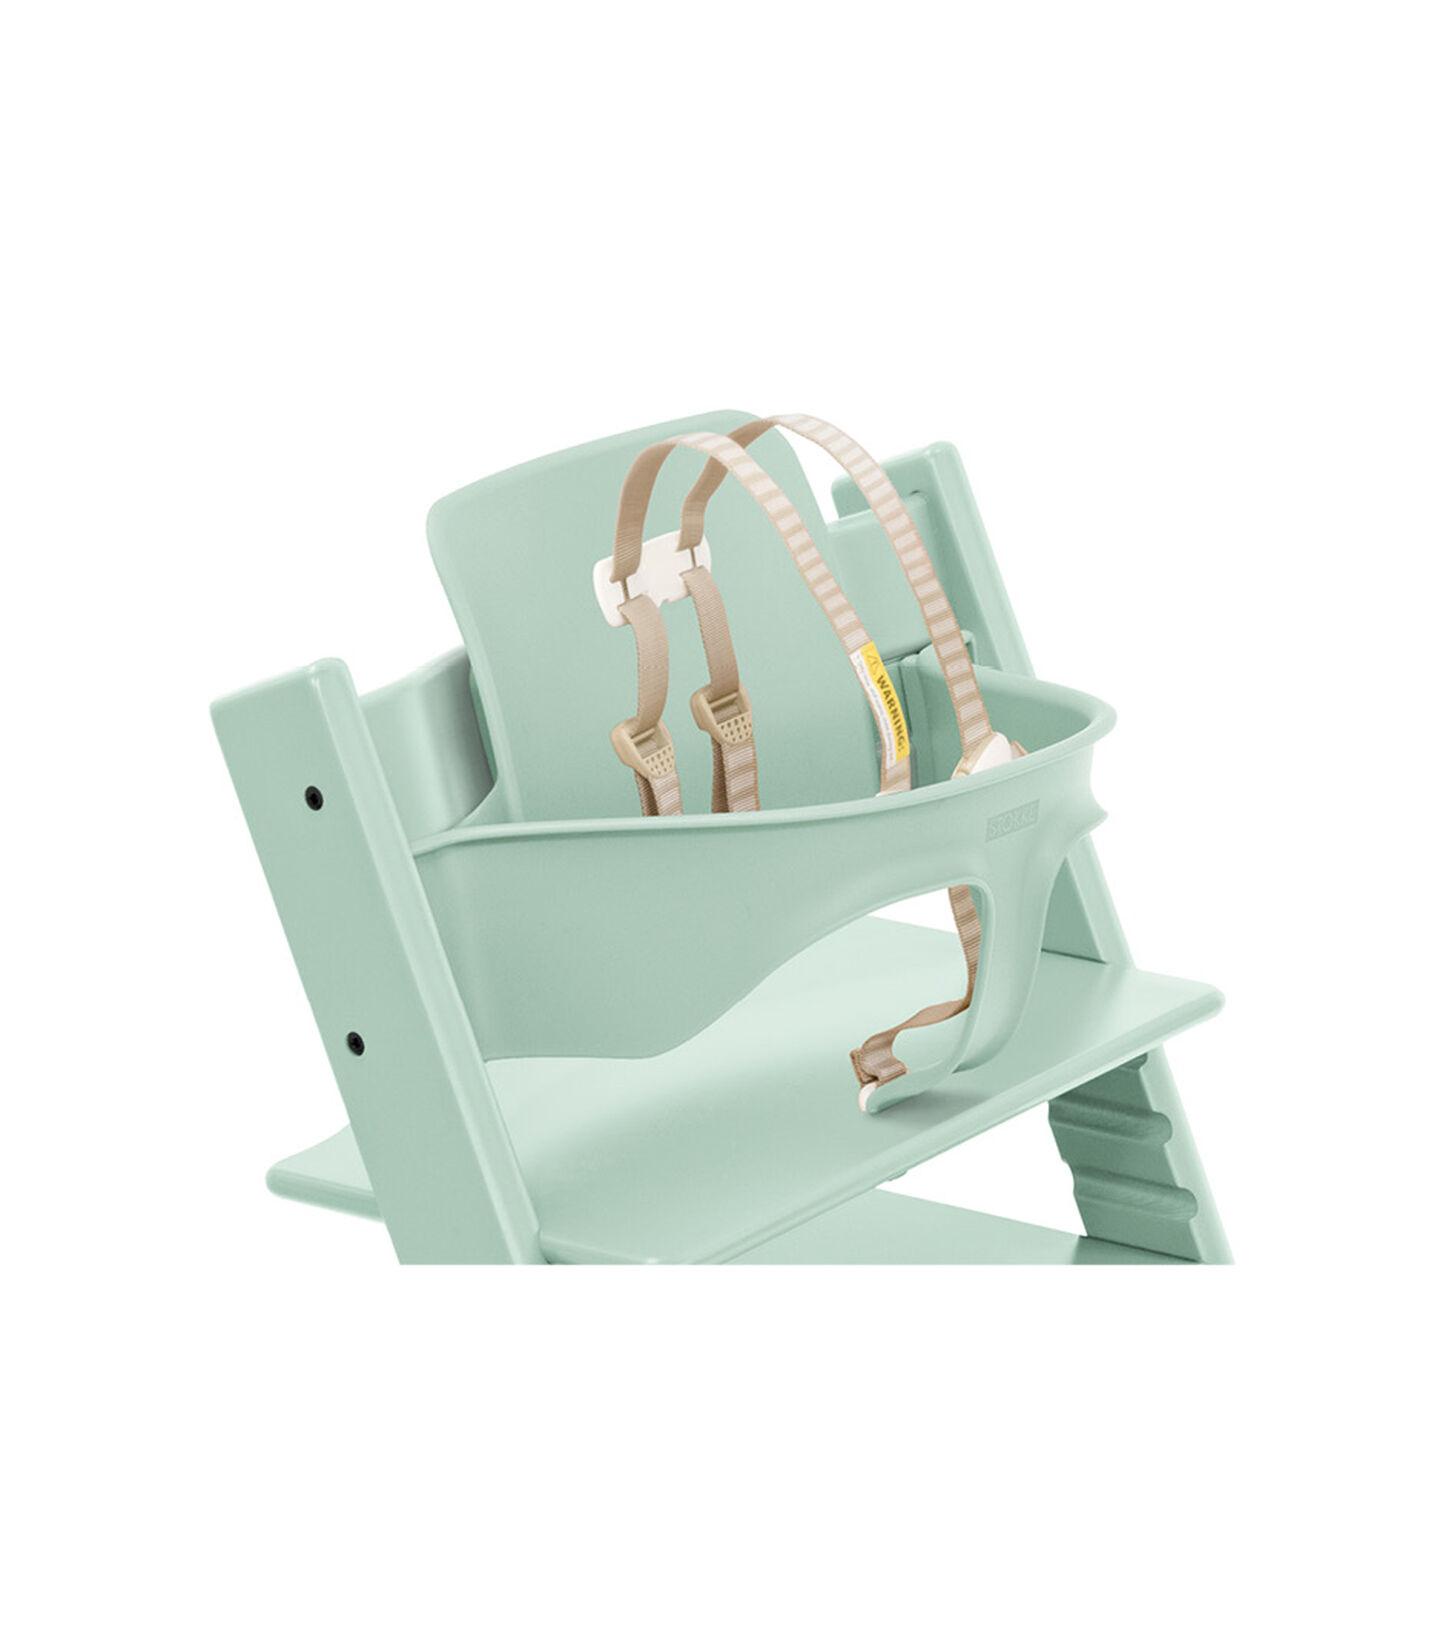 Tripp Trapp® Baby Set Soft Mint, Soft Mint, mainview